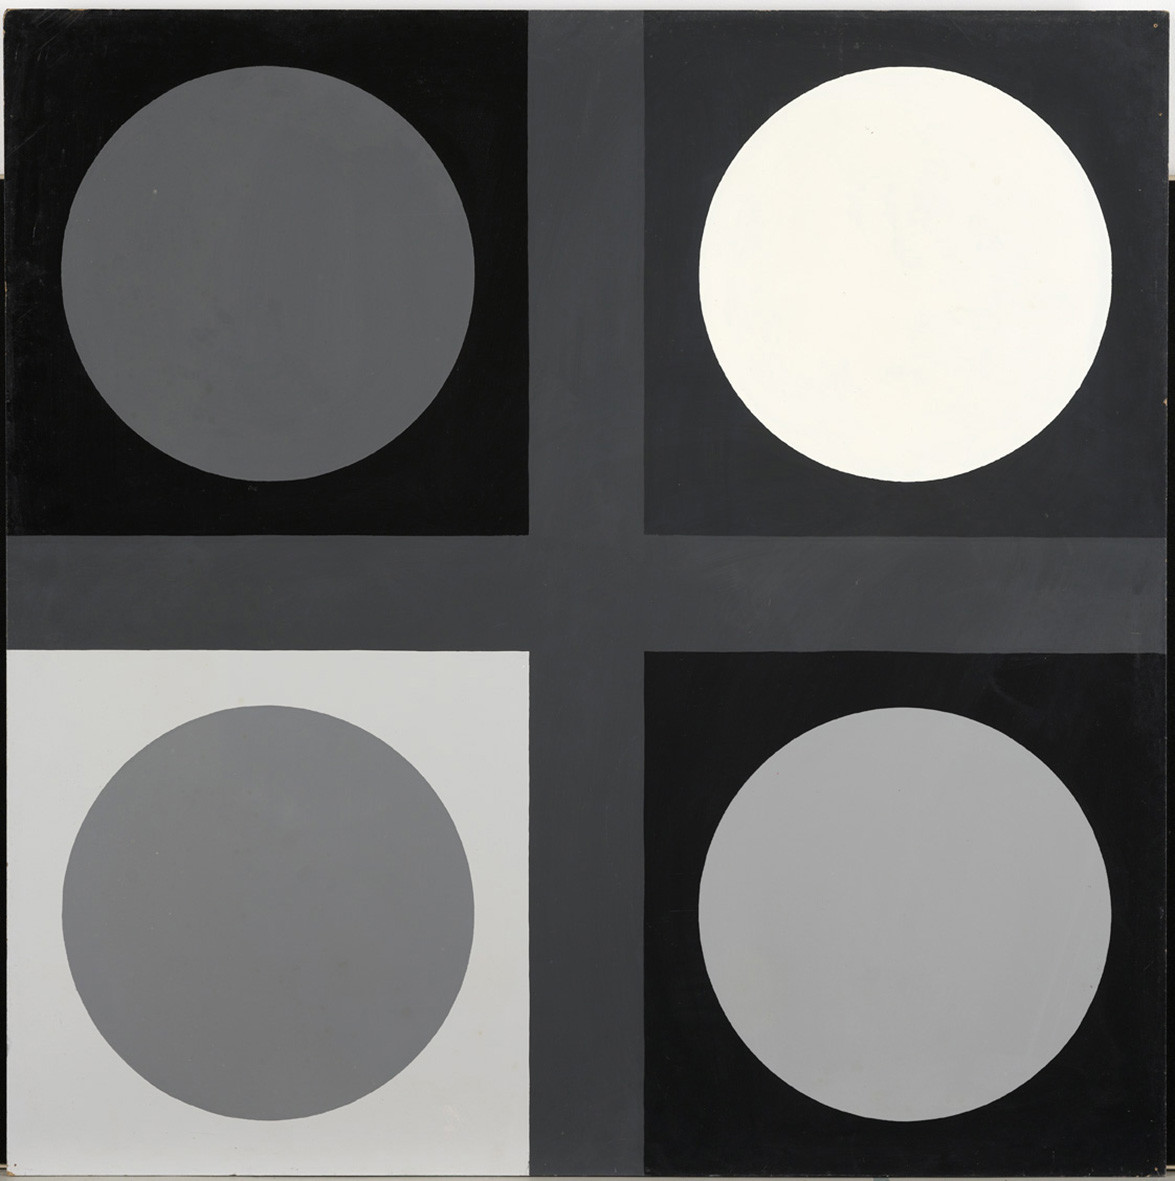 "<span class=""link fancybox-details-link""><a href=""/exhibitions/143/works/artworks11006/"">View Detail Page</a></span><div class=""artist""><strong> Poul Gernes</strong></div><div class=""title""><em>Untitled (tic tac toe painting)</em>, 1967</div><div class=""medium"">enamel paint on masonite</div><div class=""dimensions"">122.0 x 122.0 cm<br>48 x 48 in</div>"